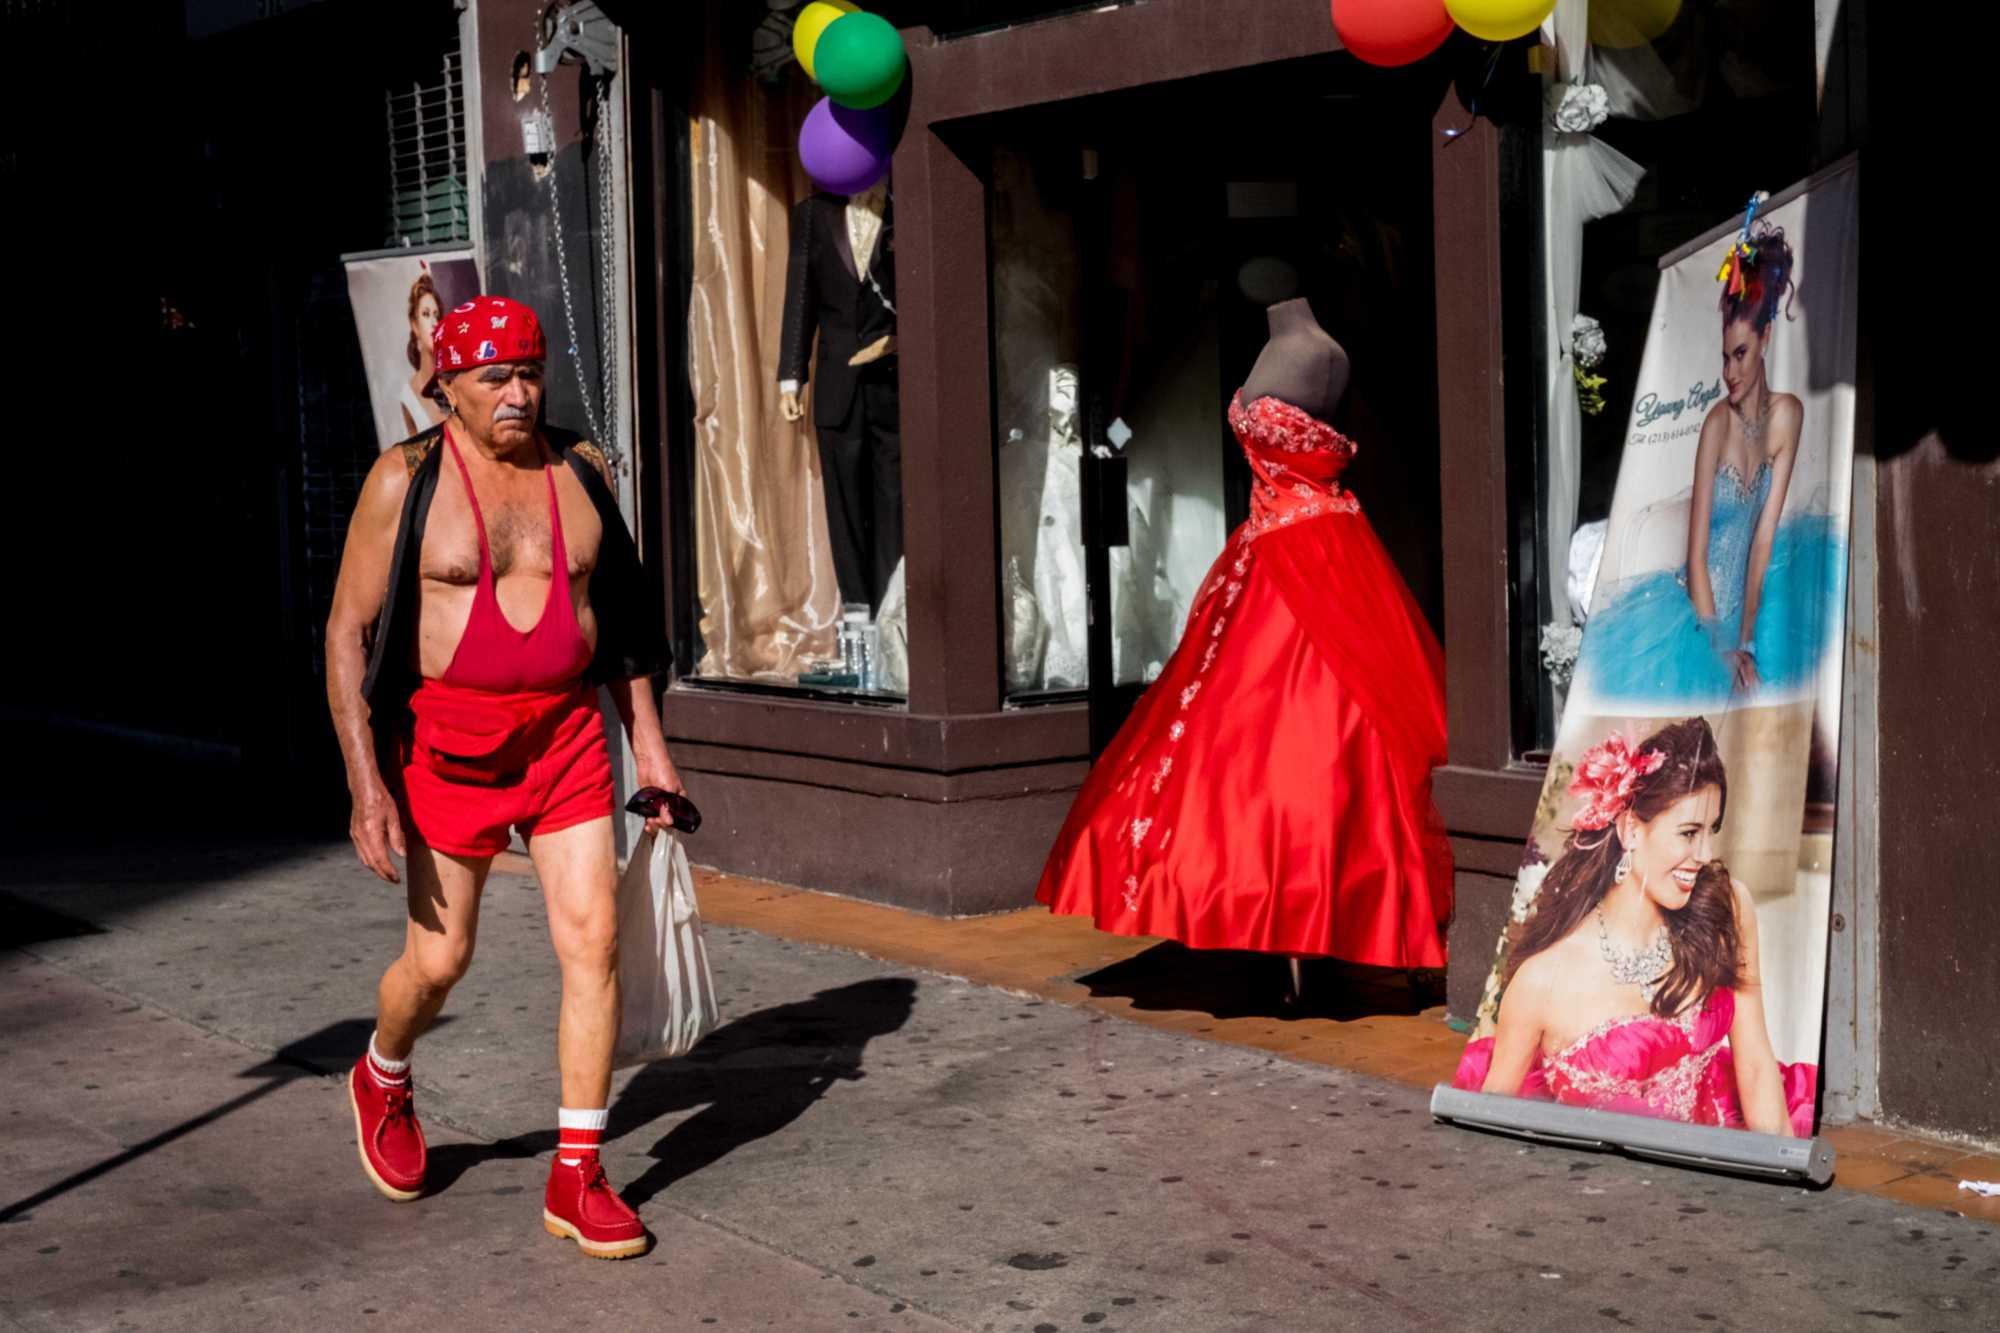 Student Photos: Downtown LA Discover Your Unique Voice in Street Photography Workshop 2016